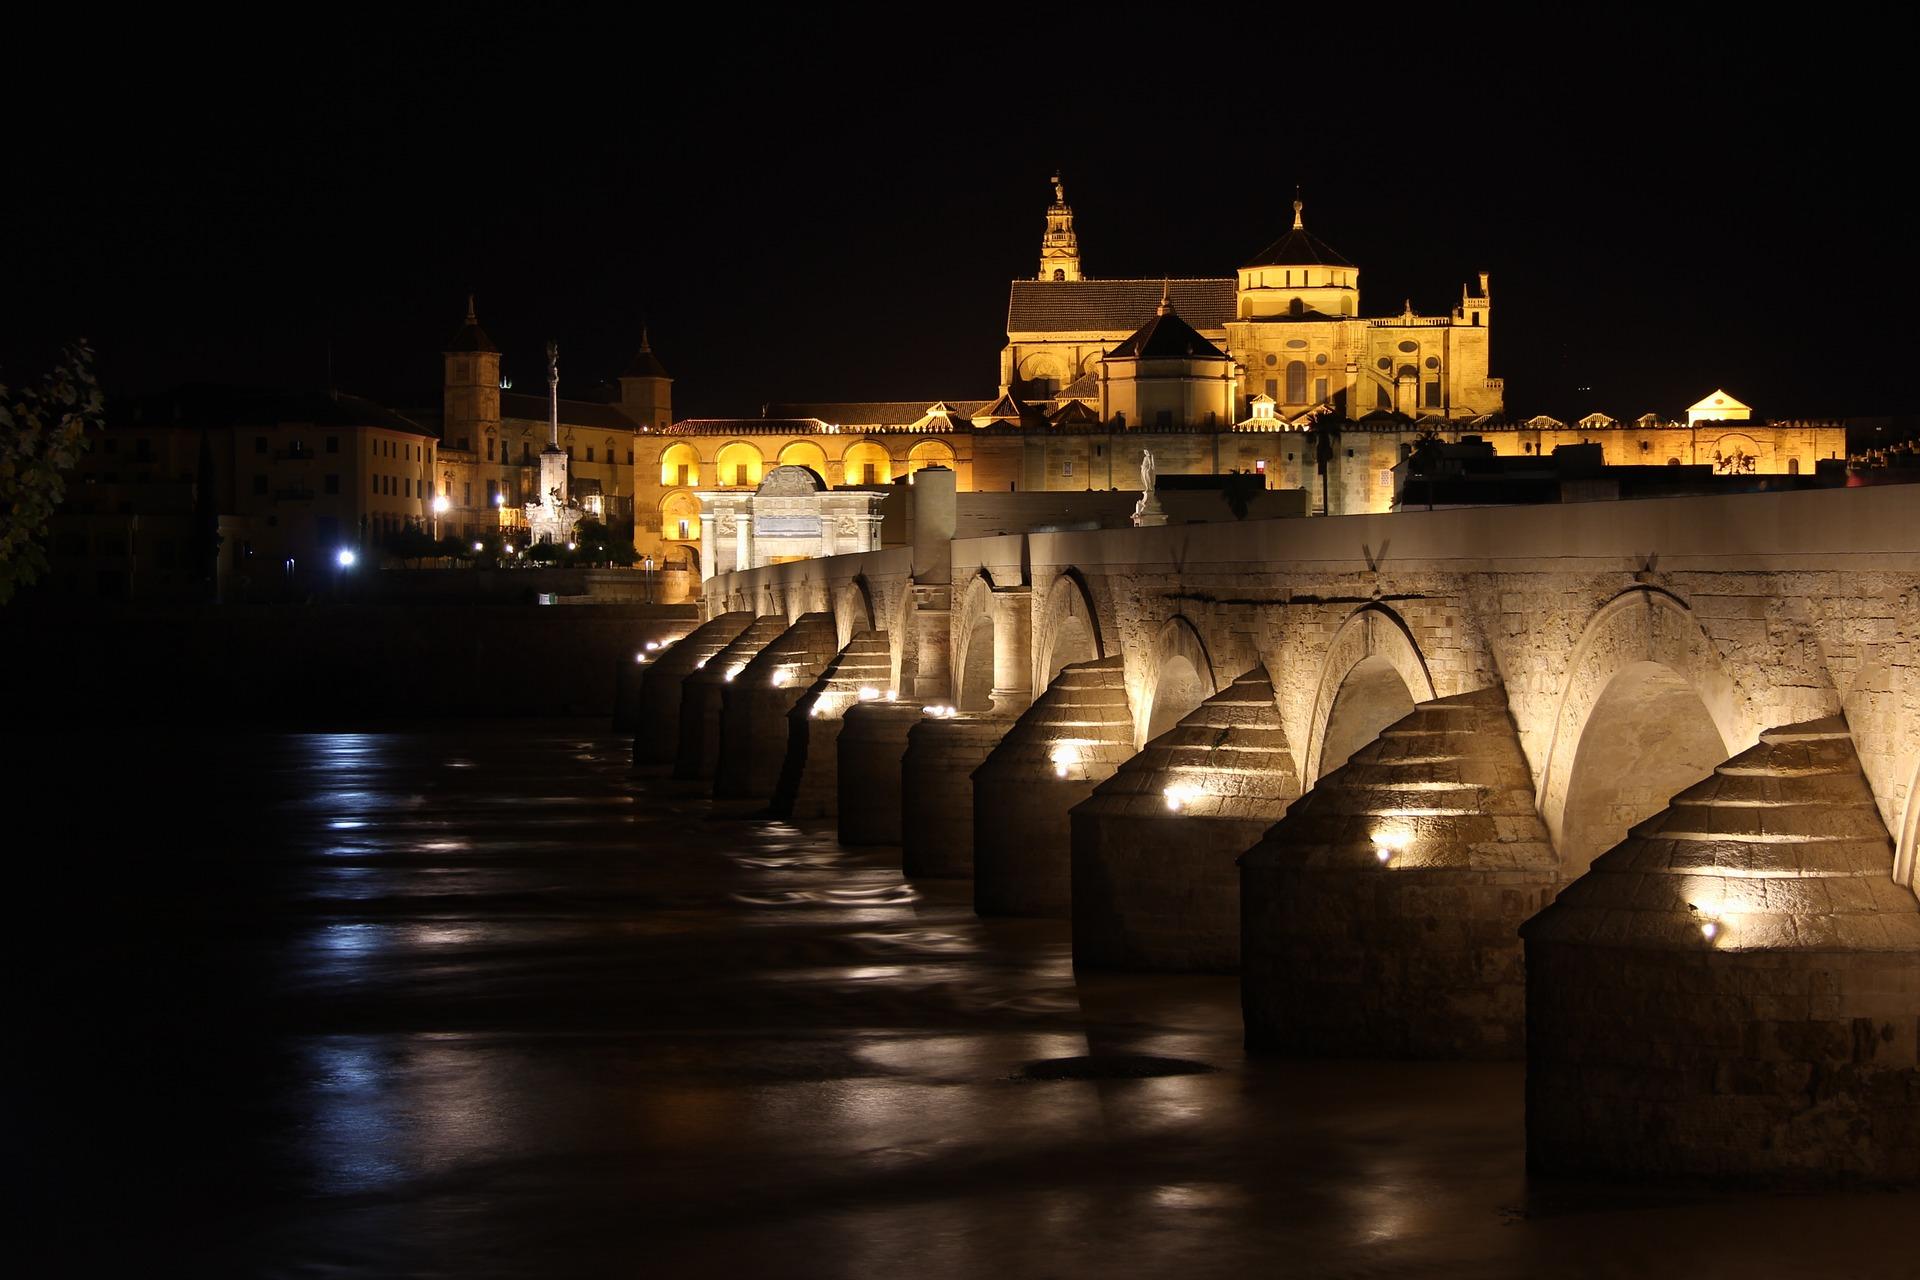 Puente de Córdoba. Photo by 1204479 on Pixabay